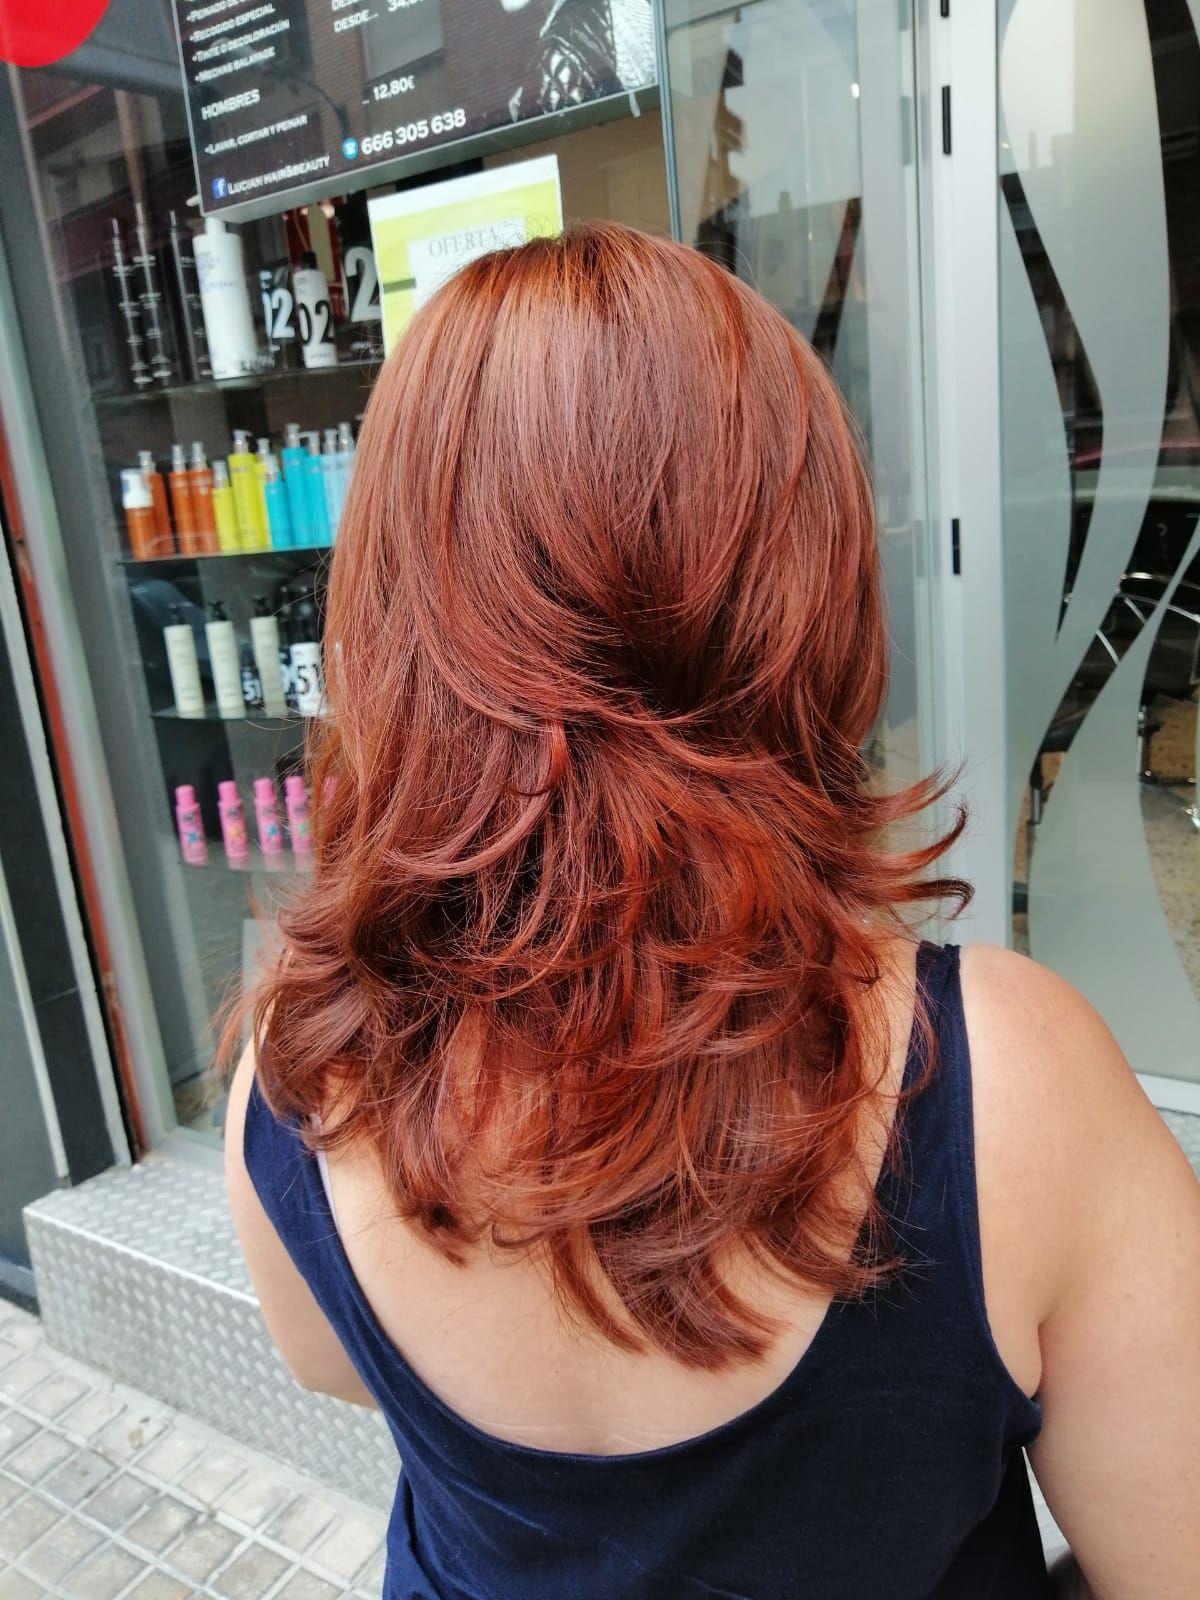 Foto 11 de Peluquería y maquillaje en  | Lucian Hair&Beauty